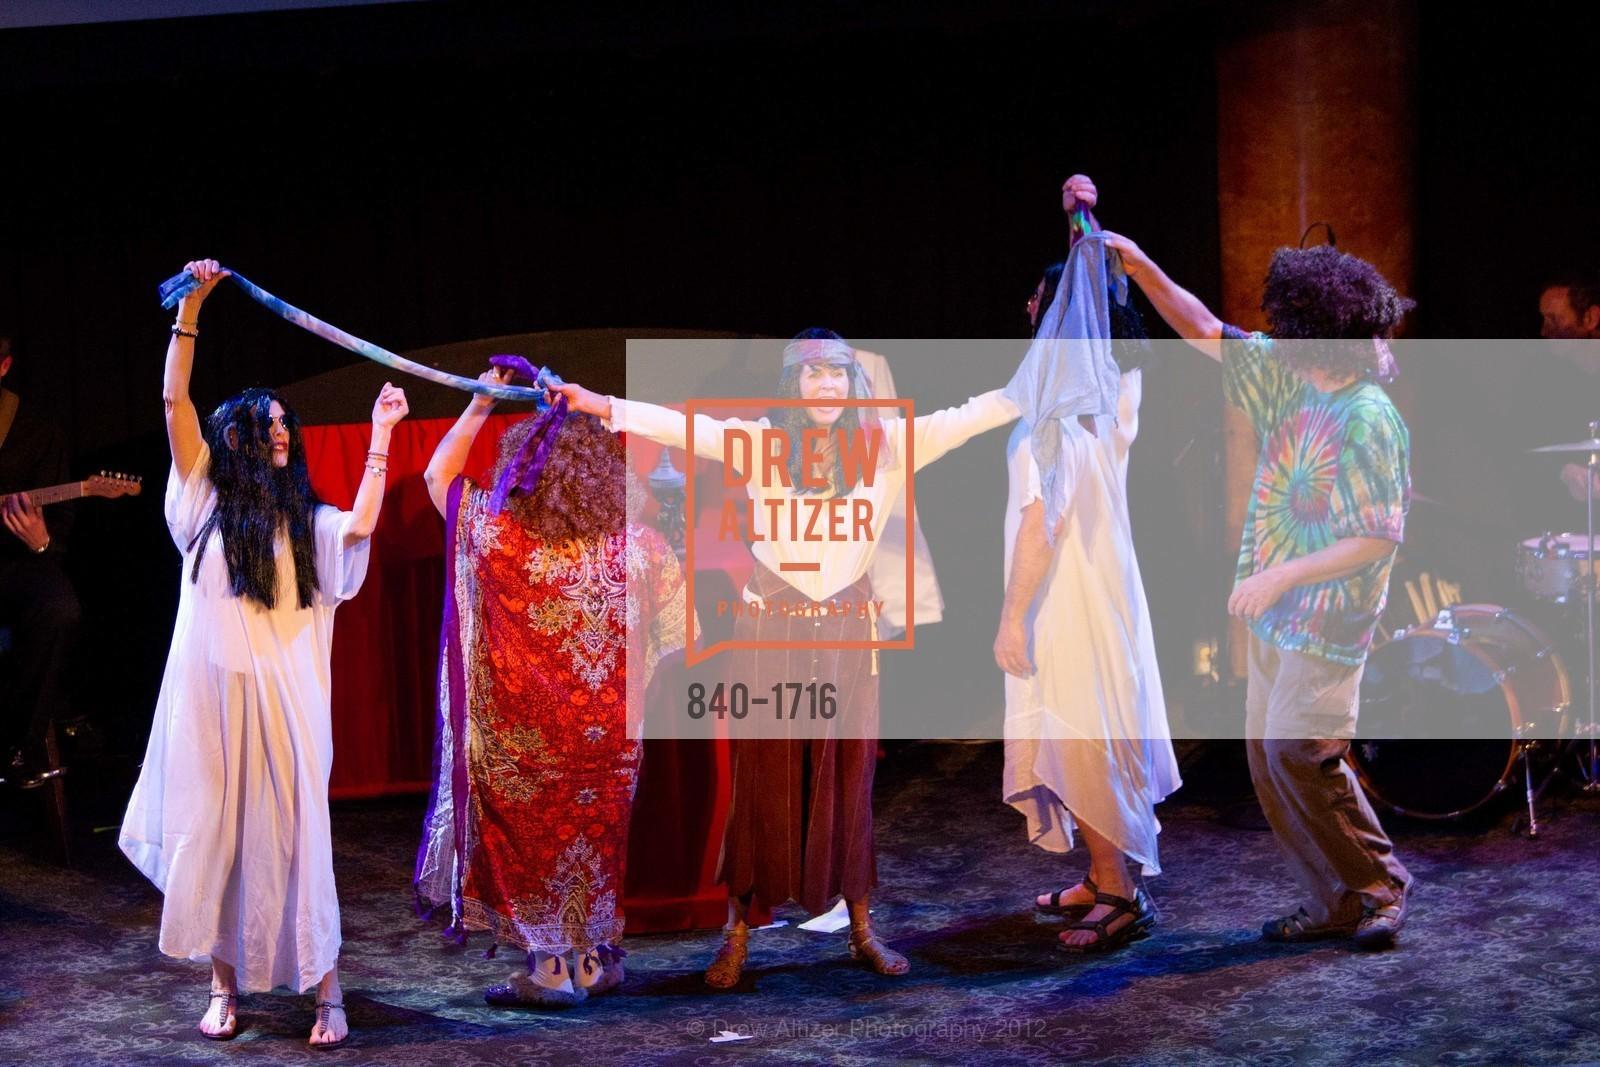 Performance, Photo #840-1716